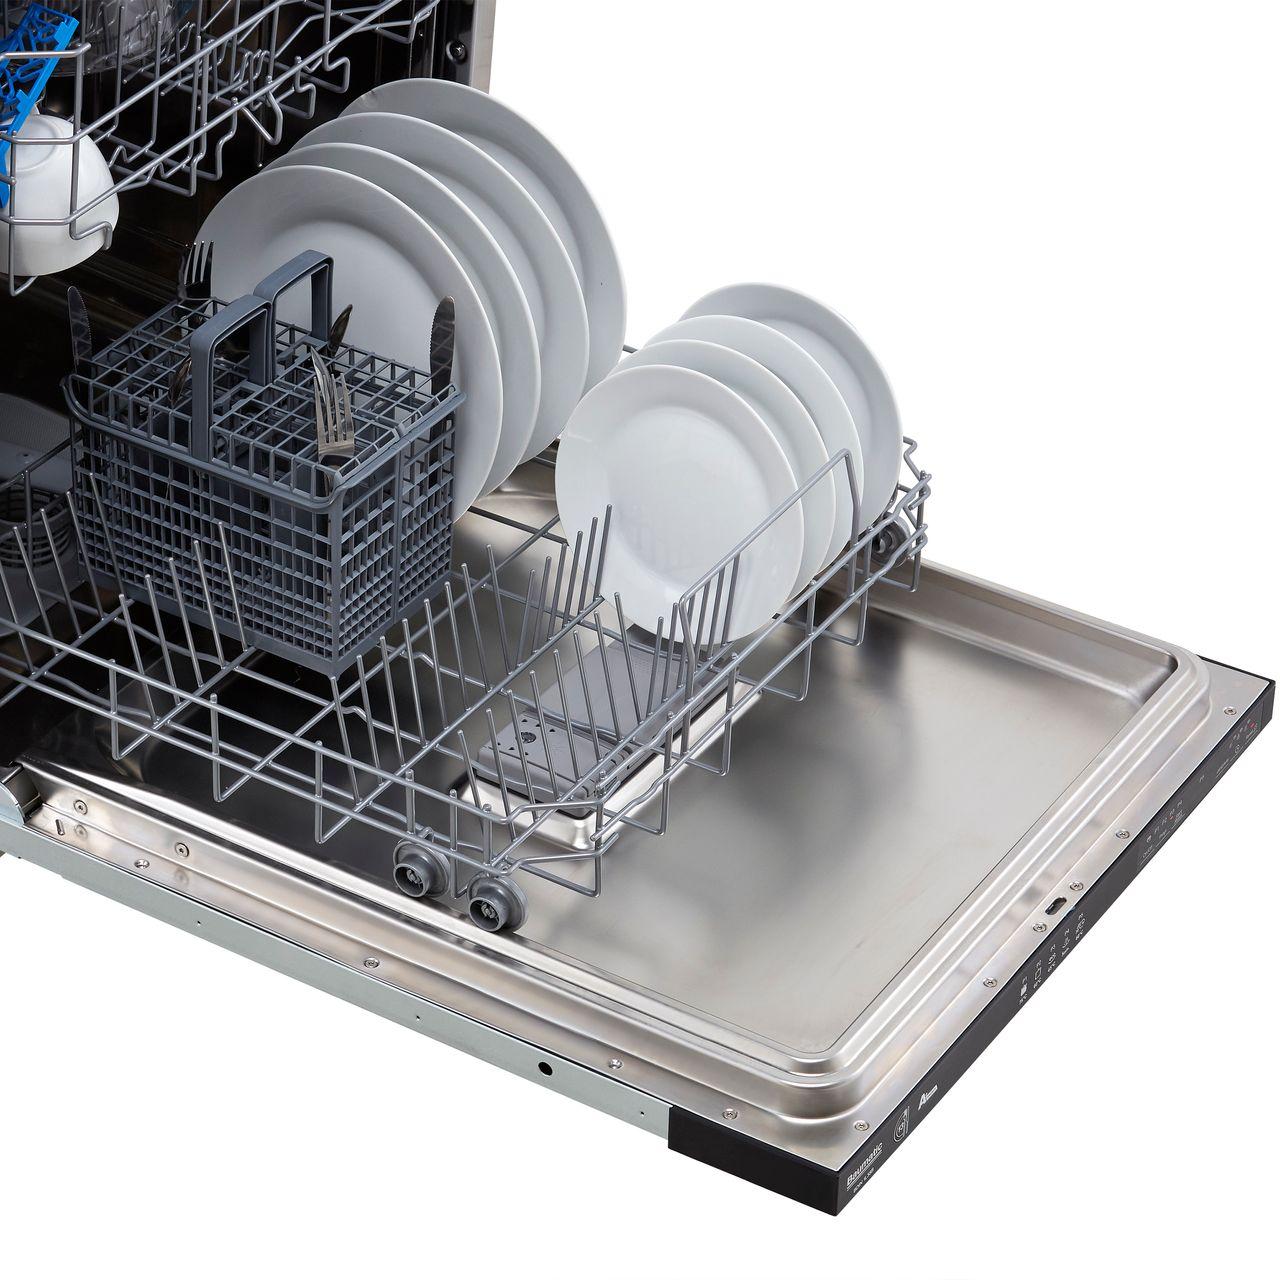 BDIN1L38B-80 | Baumatic Dishwasher | Black | ao.com